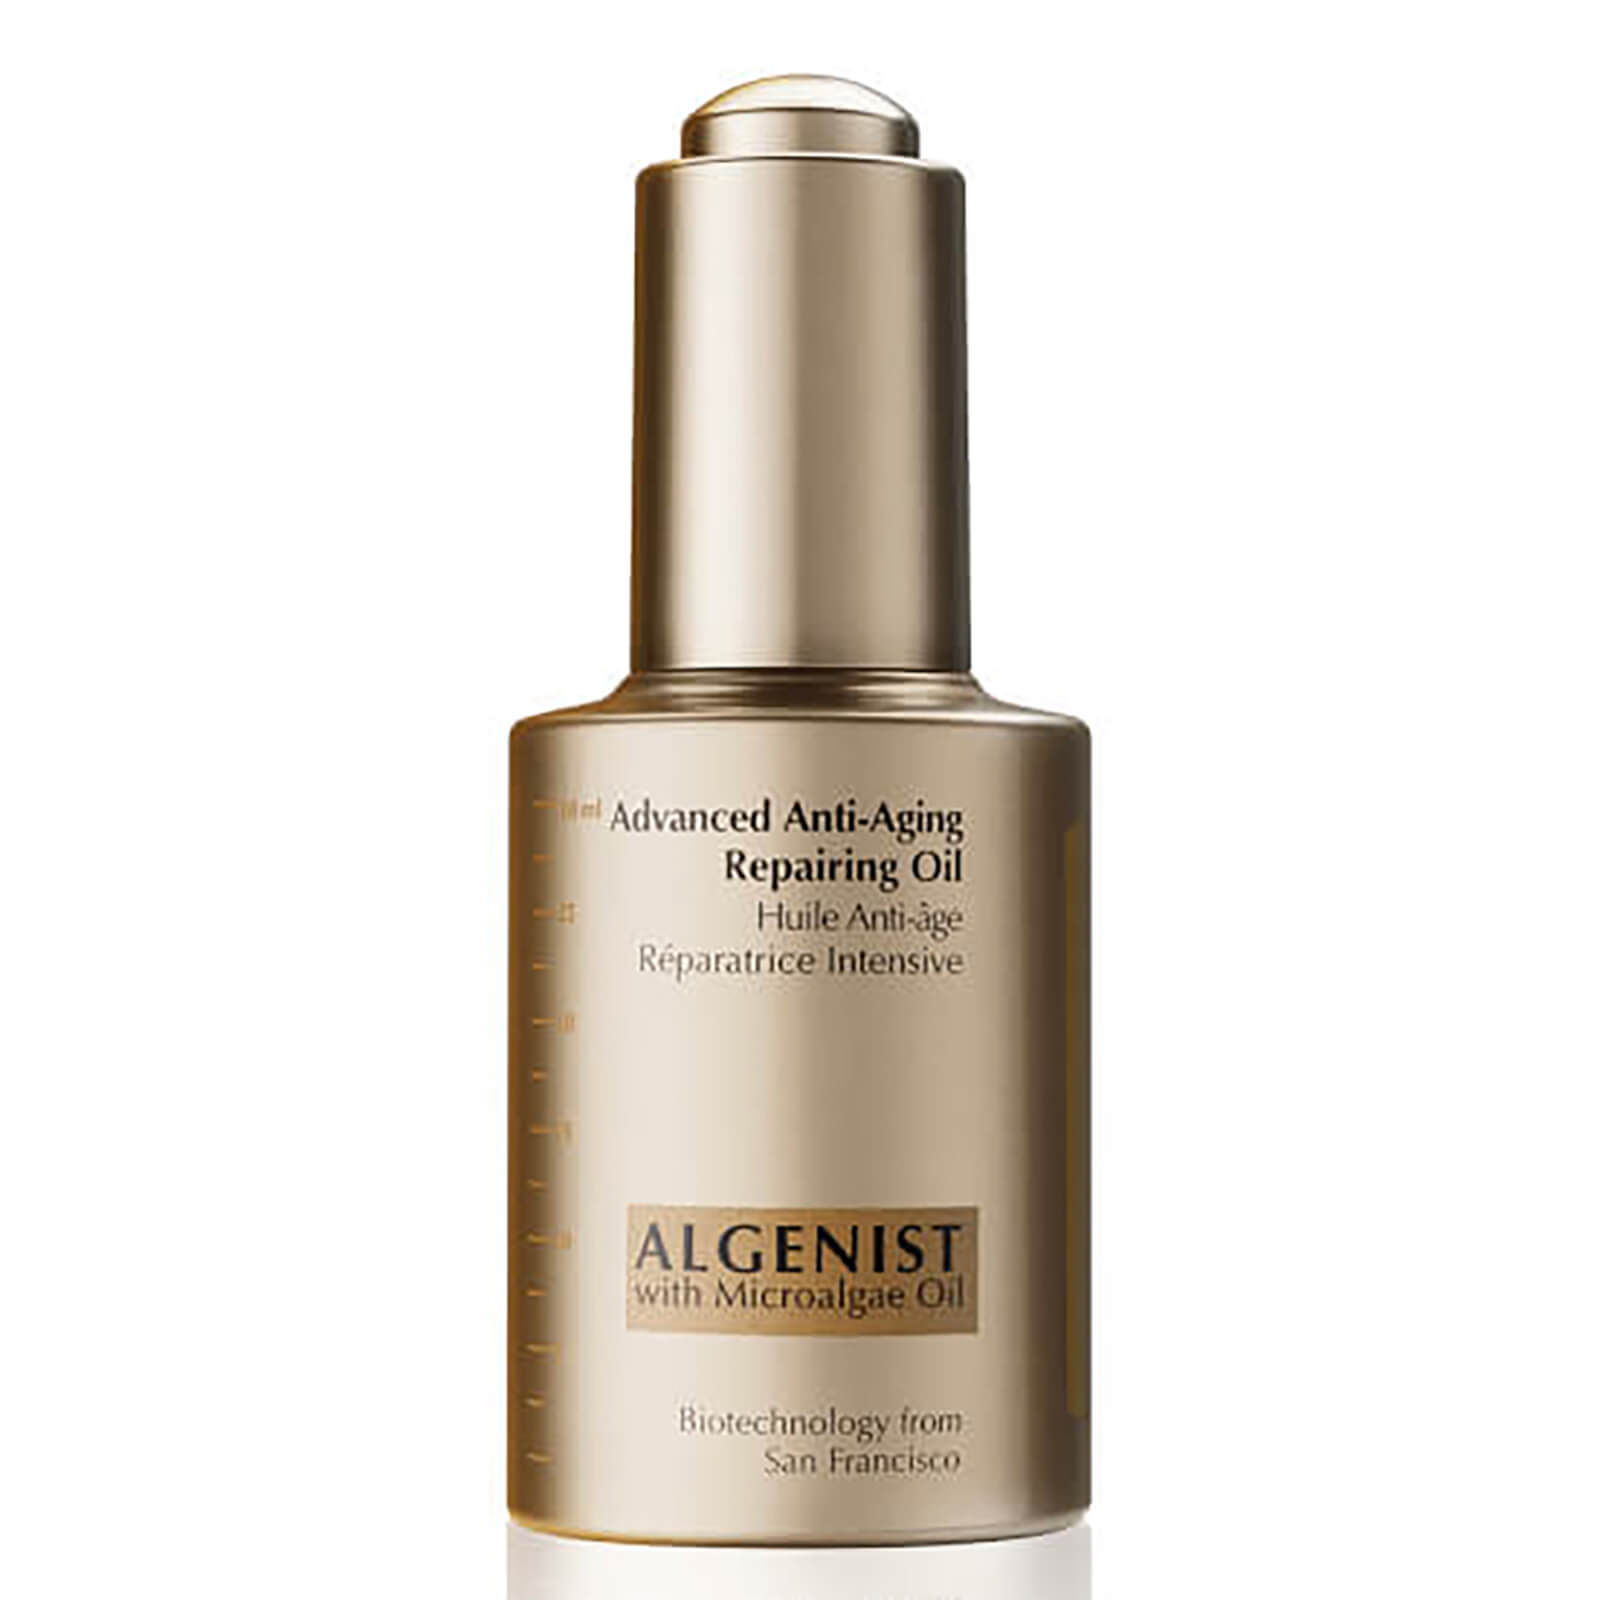 Купить Антивозрастное восстанавливающее масло ALGENIST Advanced Anti-Ageing Repairing Oil 30 мл